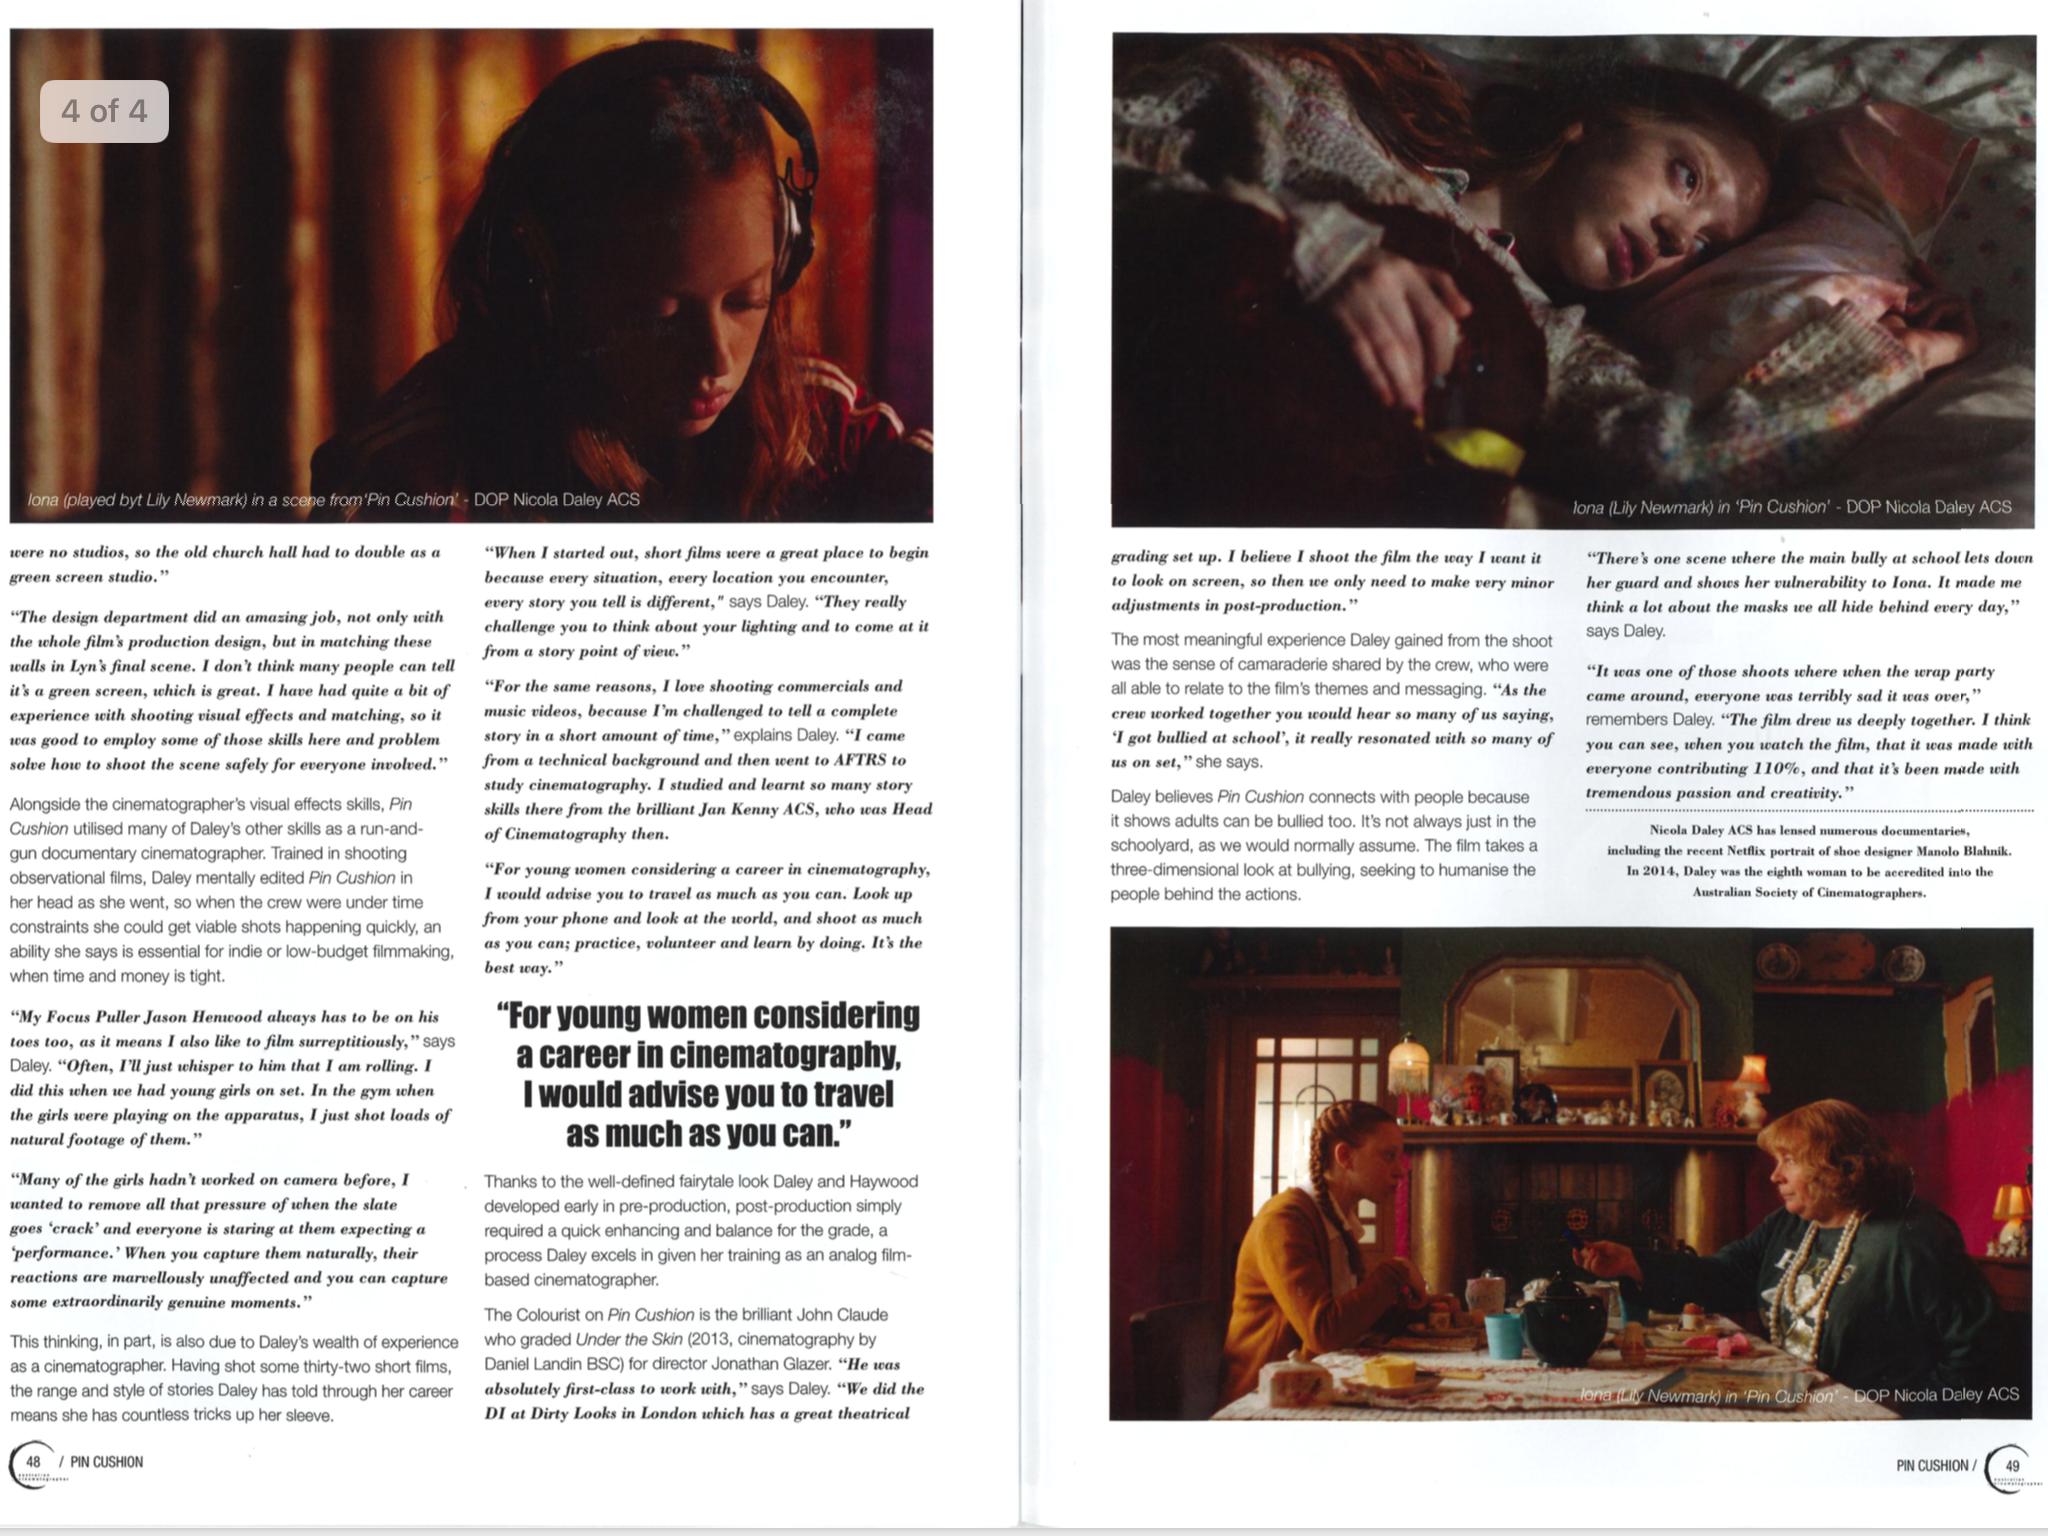 NICOLA DALEY ACS + AUSTRALIAN CINEMATOGRAPHERS MAGAZINE